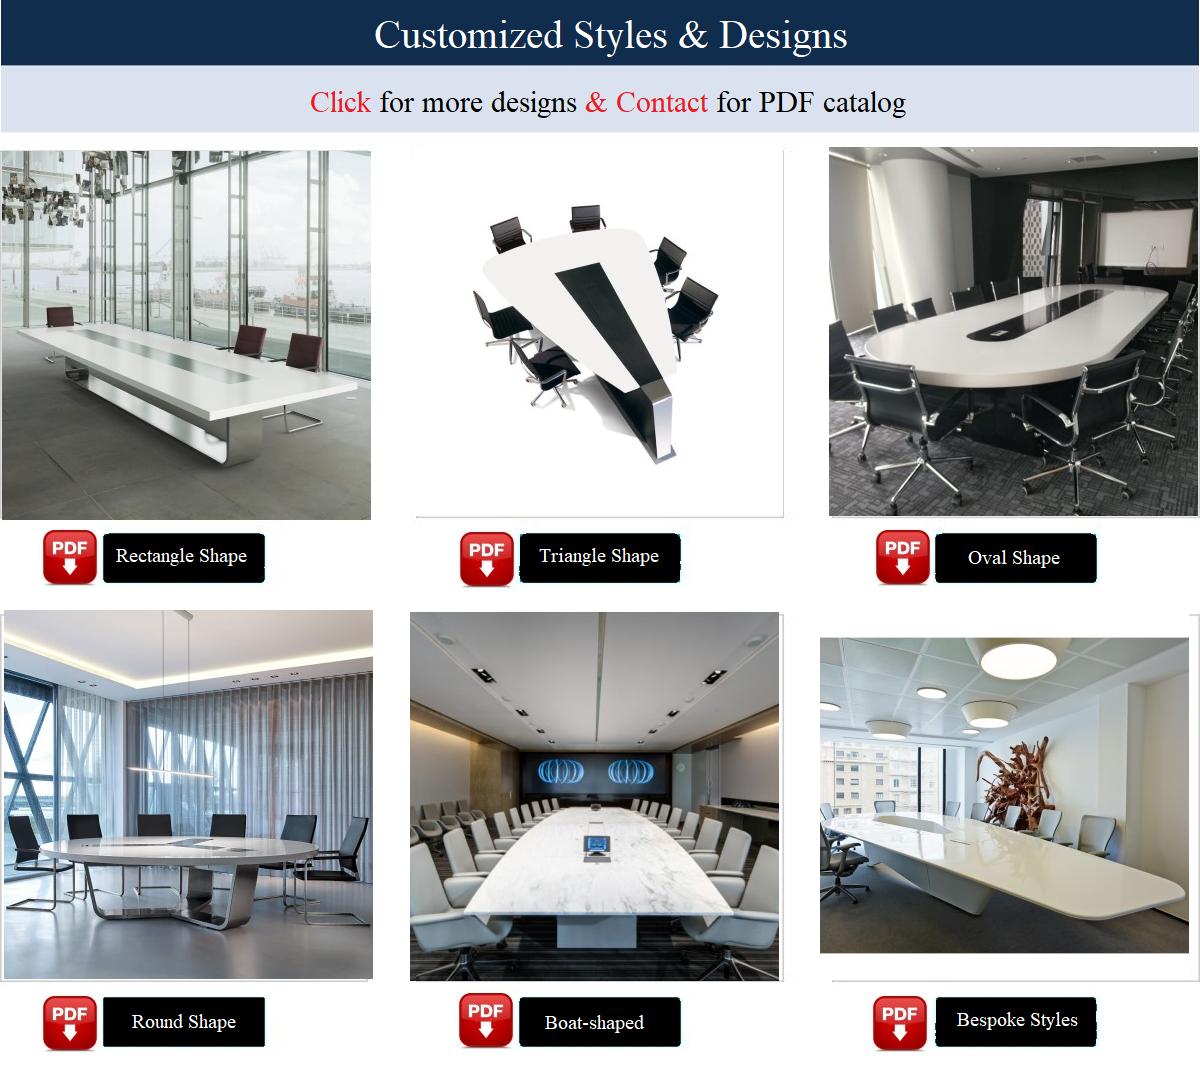 Conferentieruimte Tafel Modern Design Kantoor Smart Kleine Rechthoek Witte Corian Marmeren Quartz Stone Top Vergadertafel